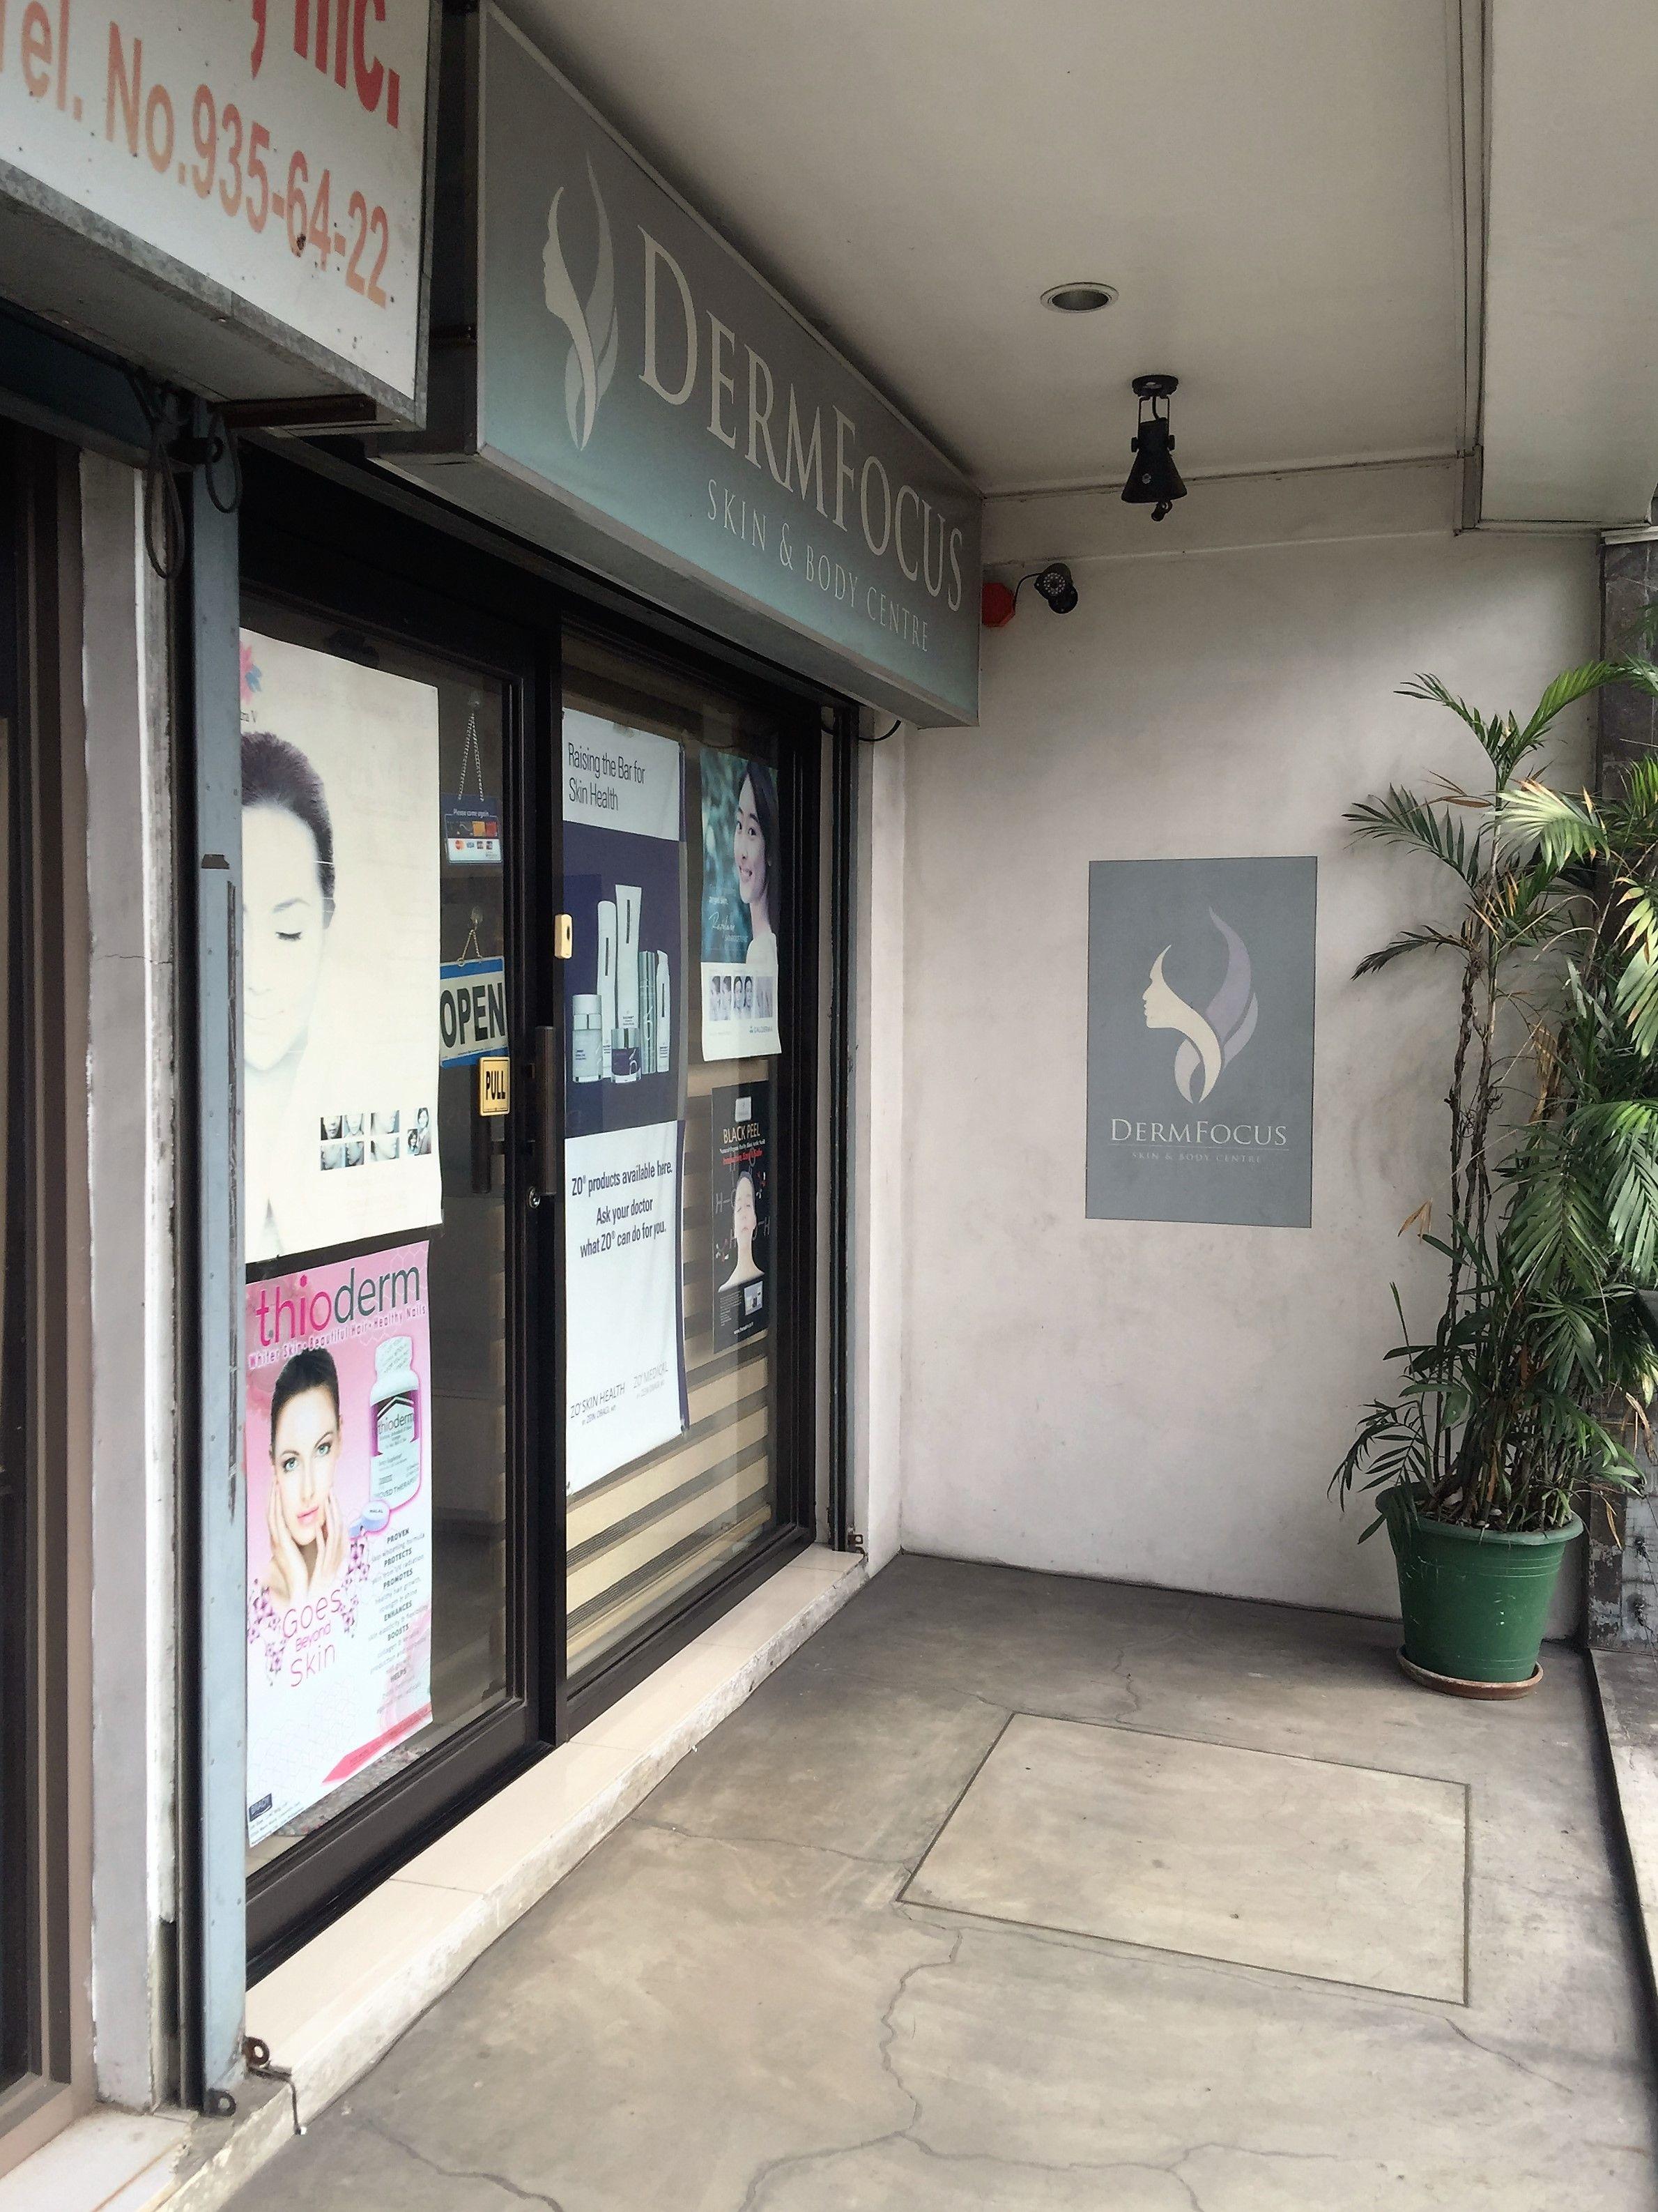 Derm Focus Skin and Body Centre (Fairview)